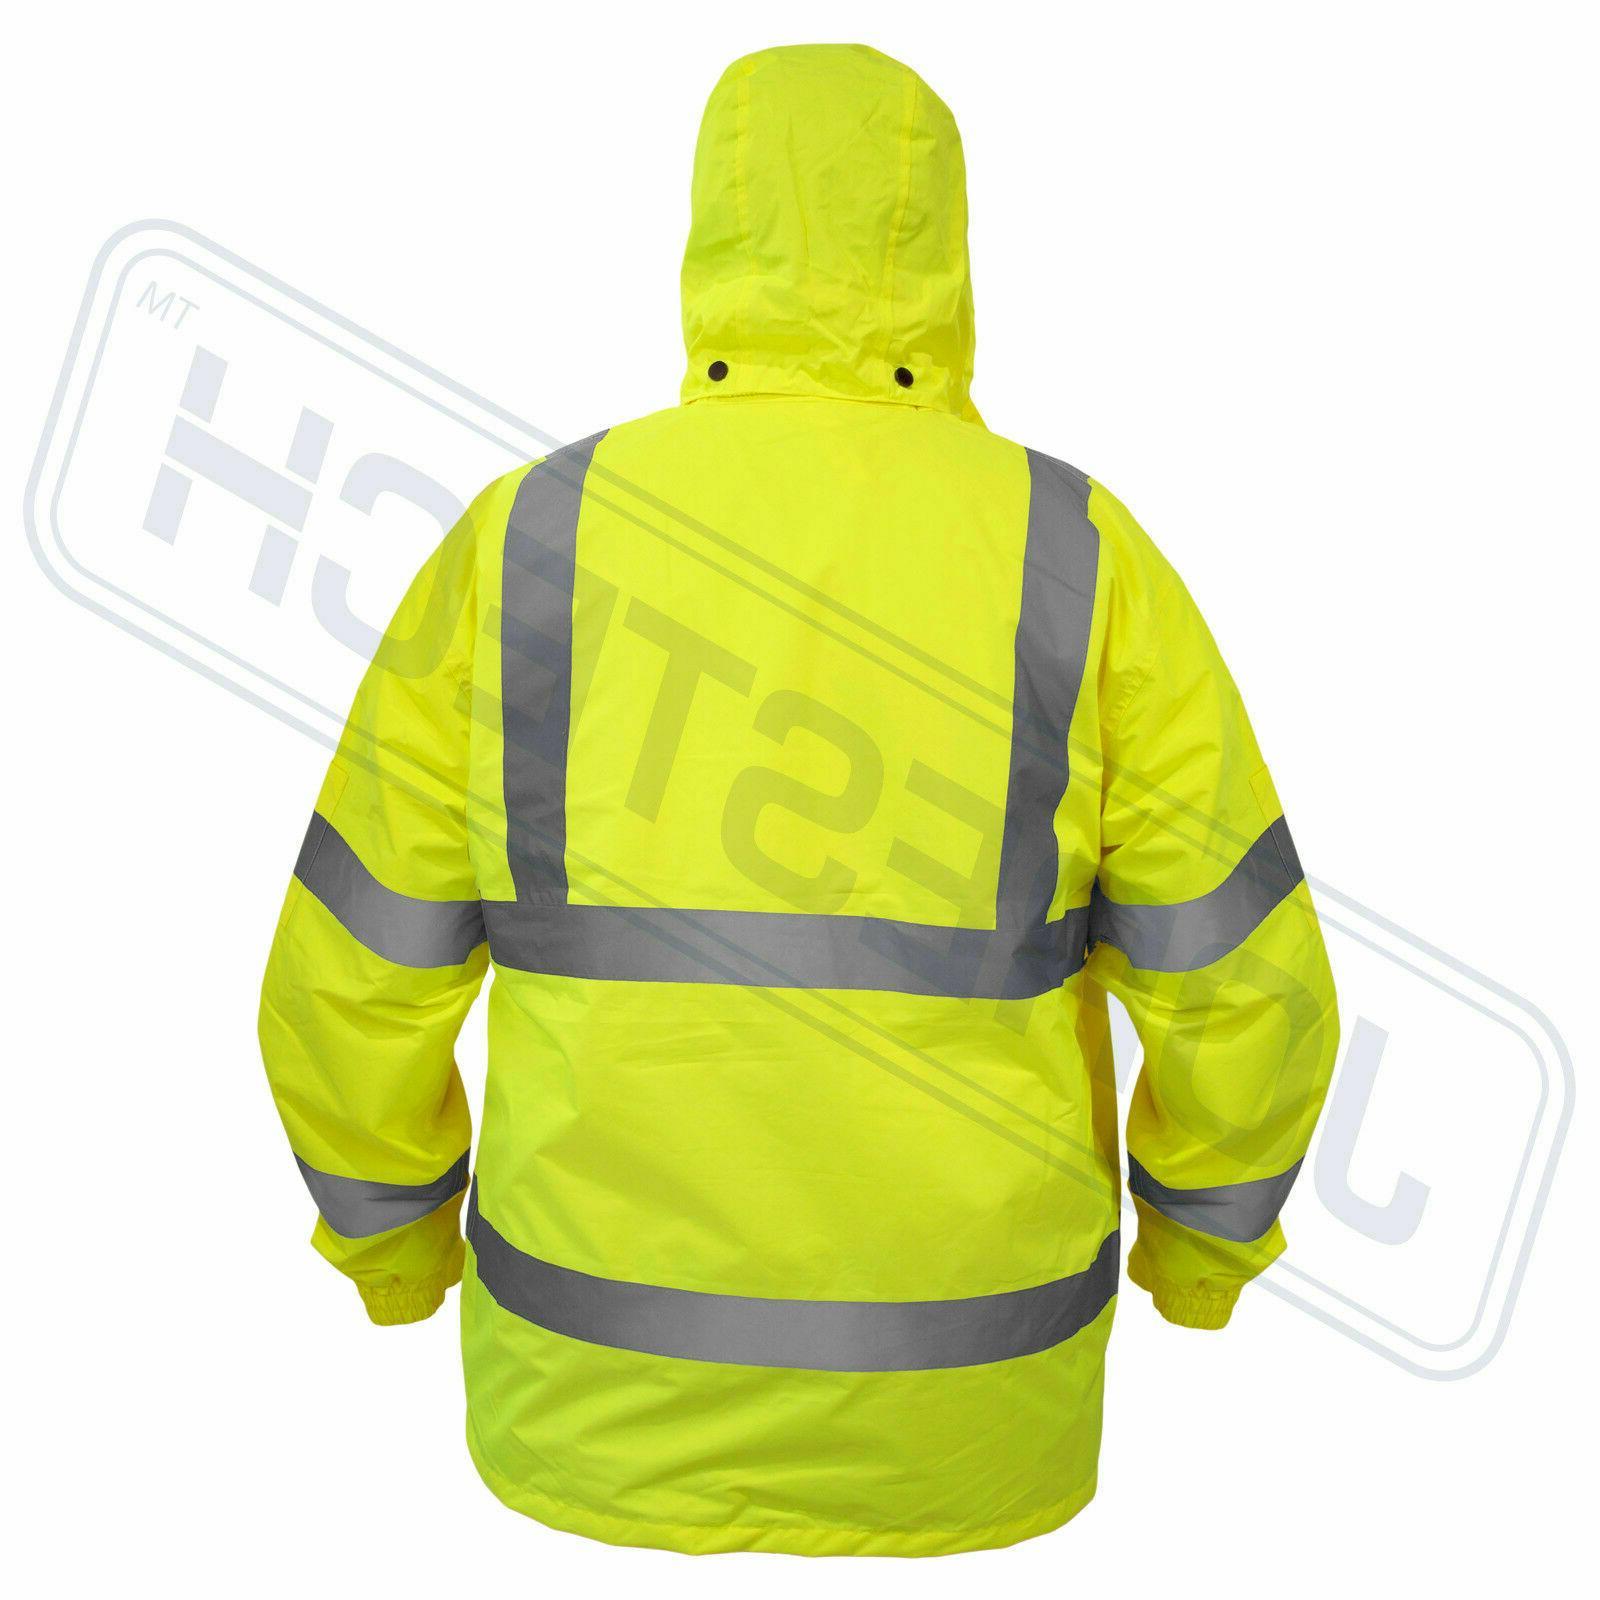 Safety Jacket Reflective Green Raincoat w